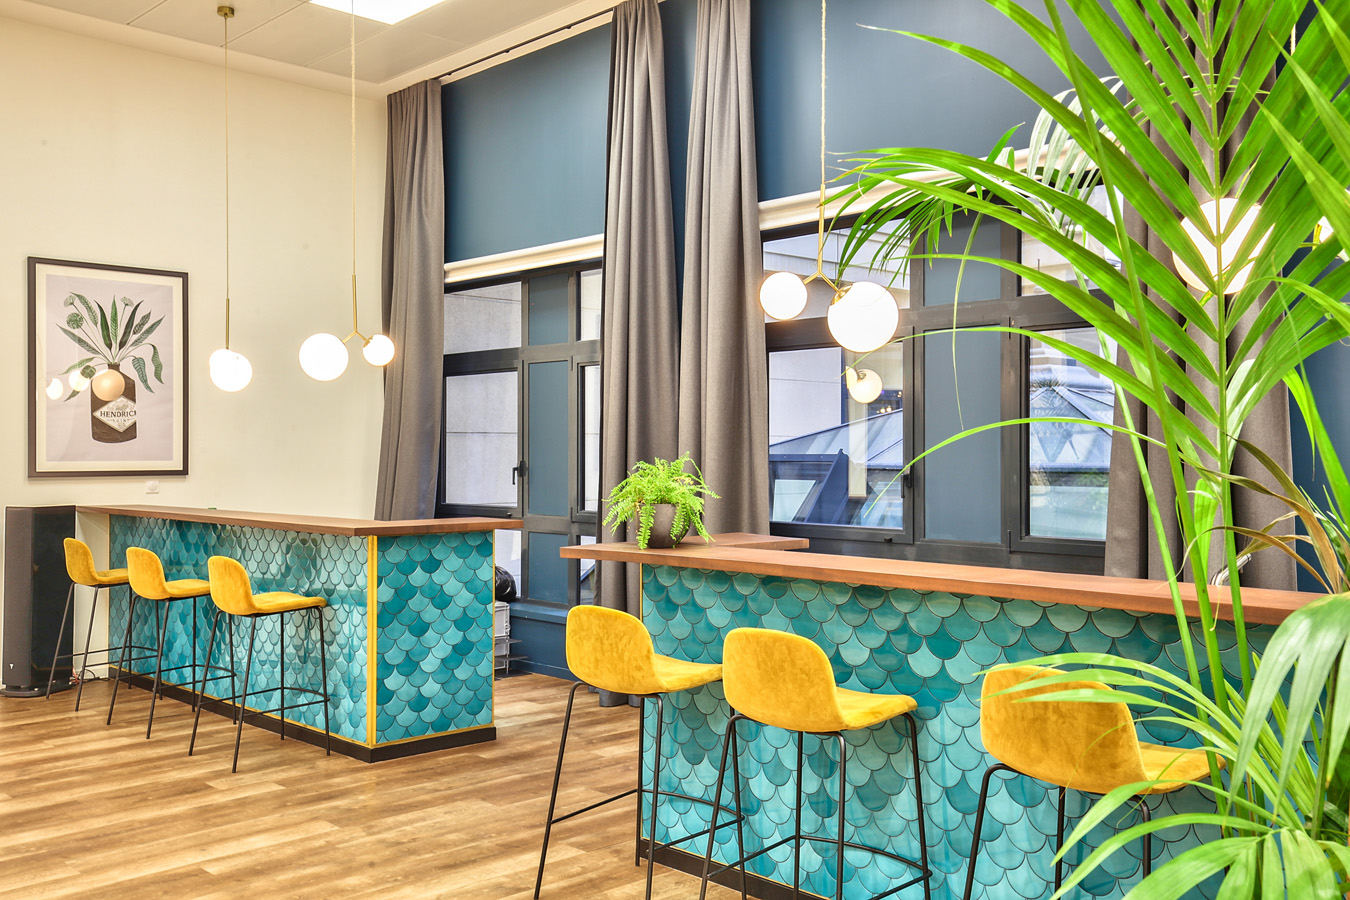 nicolas vade - architecture interieur - bureaux design - Aircall - bar 2.jpg